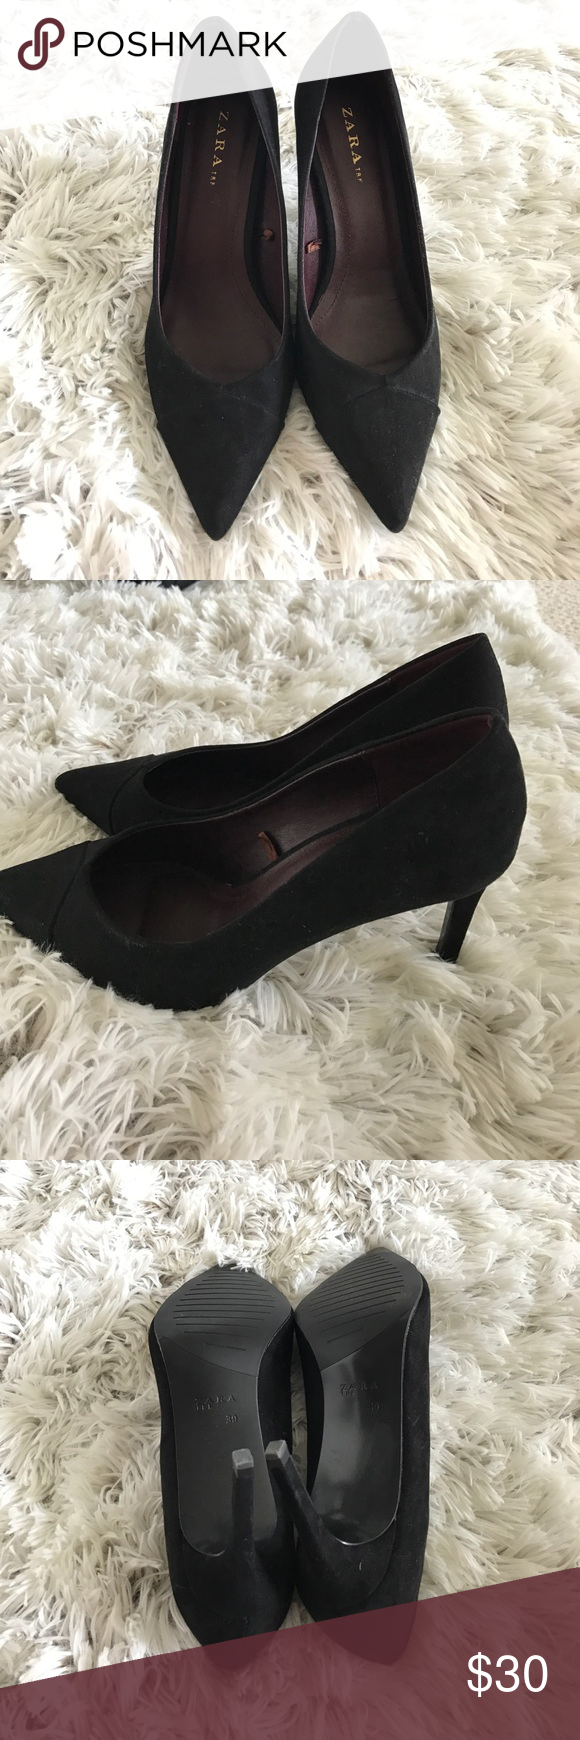 Zara Suede pump size 39 Used once, like brand new Zara suede black pump. Zara Shoes Heels